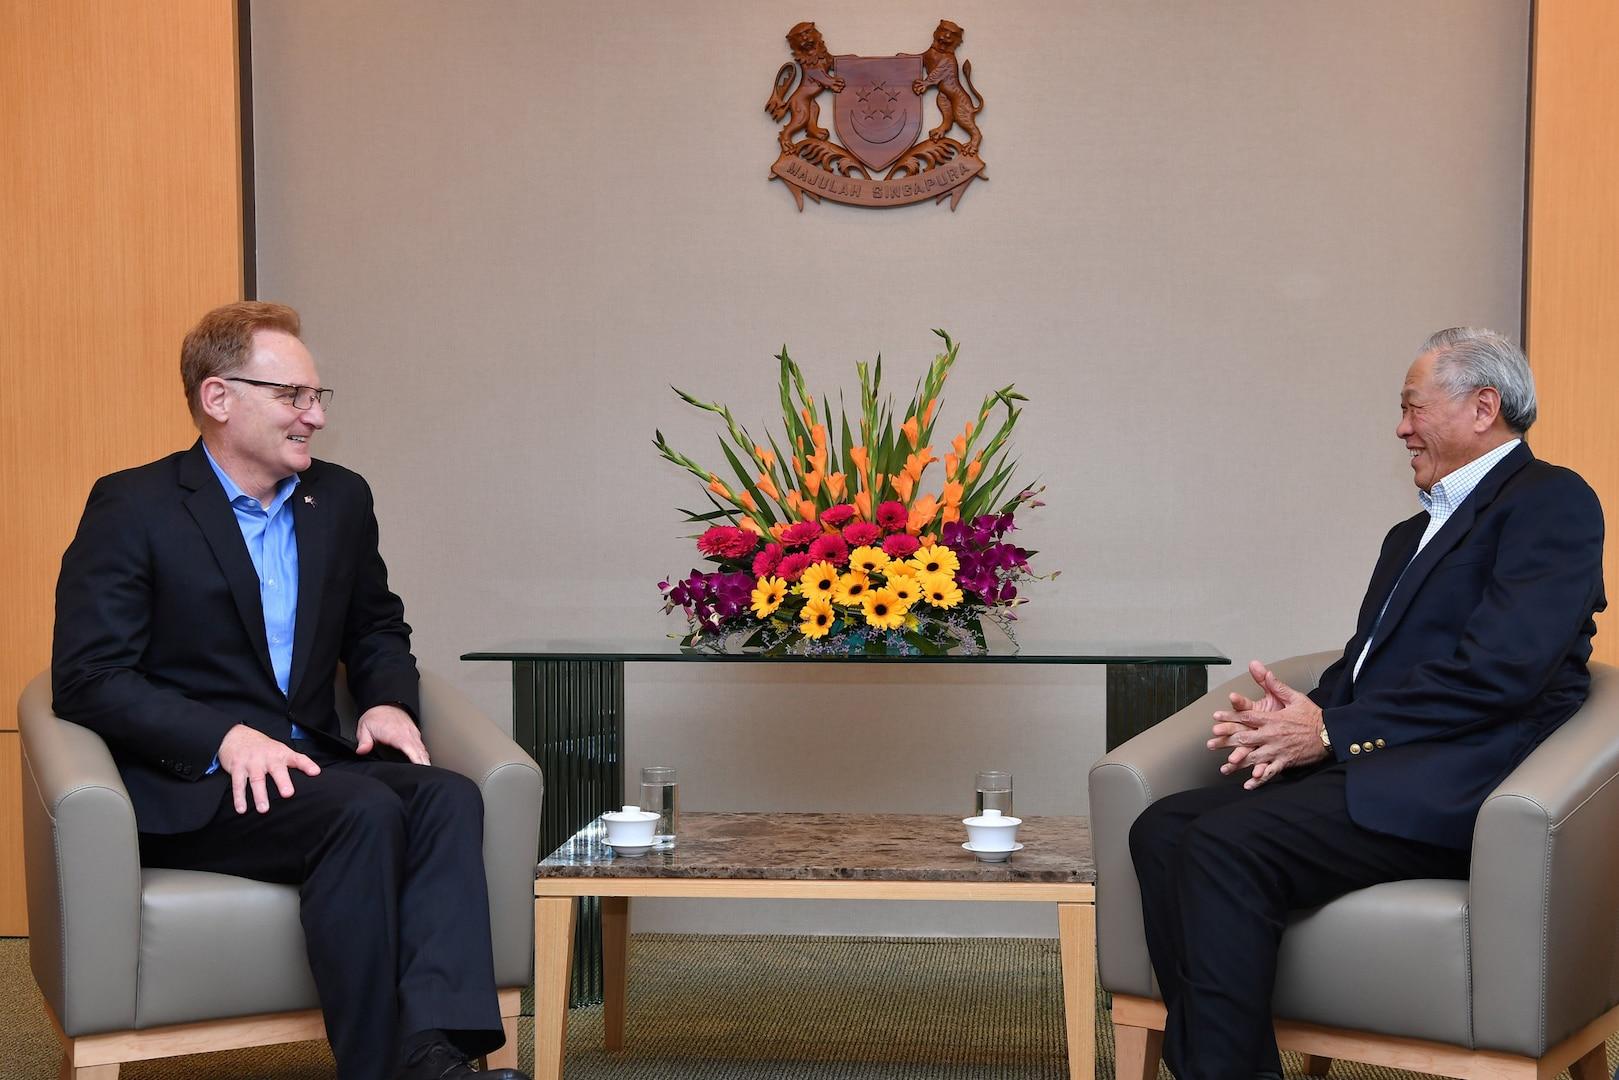 Acting SECNAV's Singapore Visit Reaffirms Strong Partnership